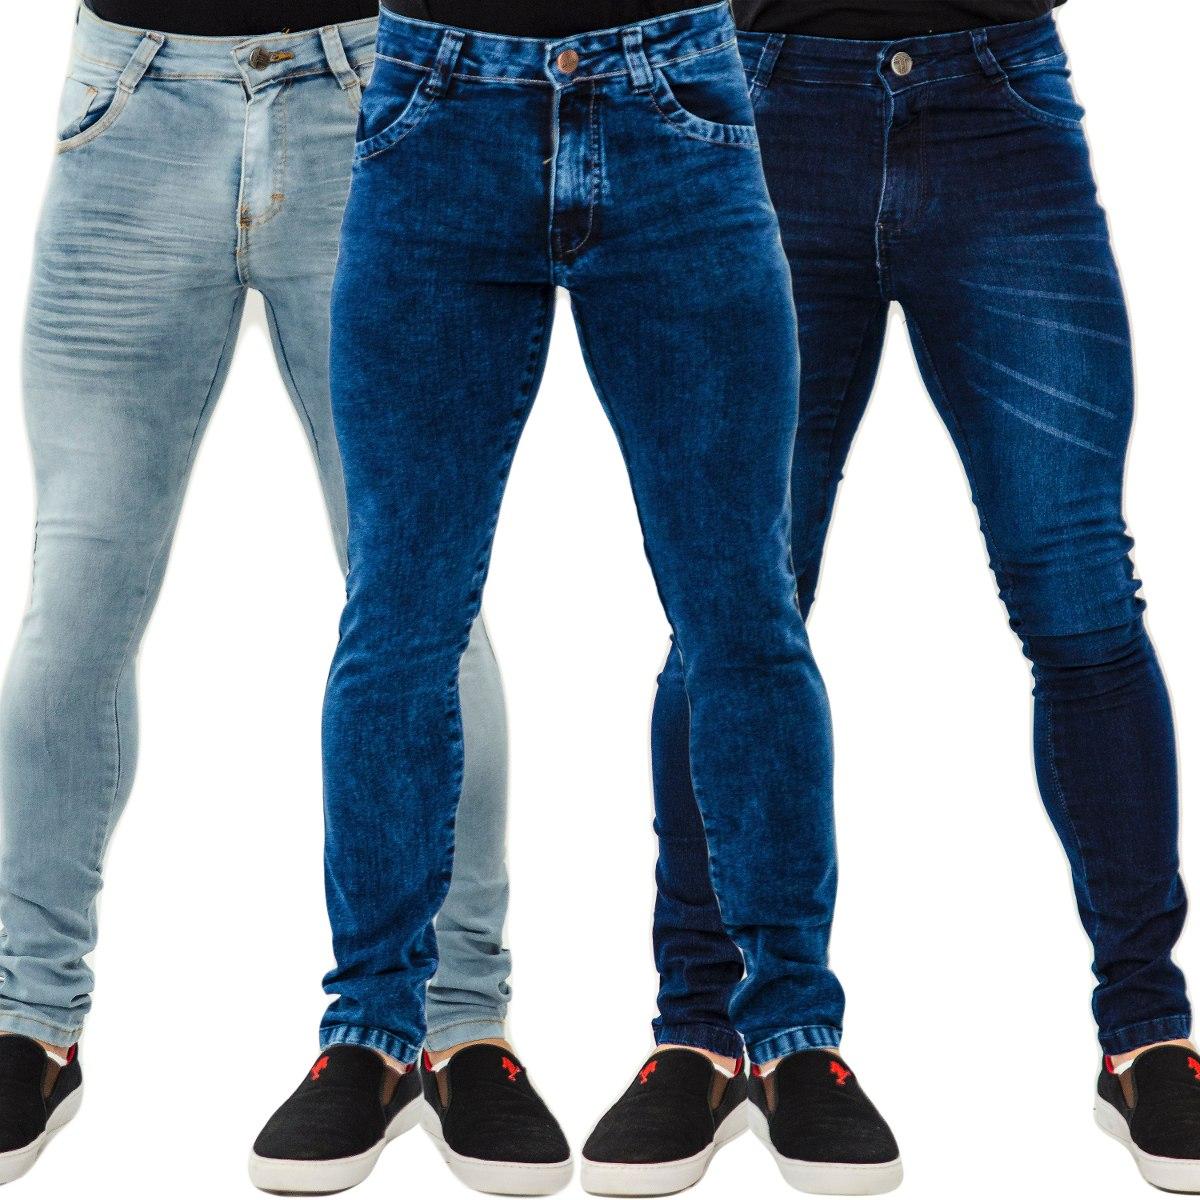 Kit 4 Calças Jeans Masculina Skinny C  Lycra Slim Especial - R  216 ... ab412a1529201